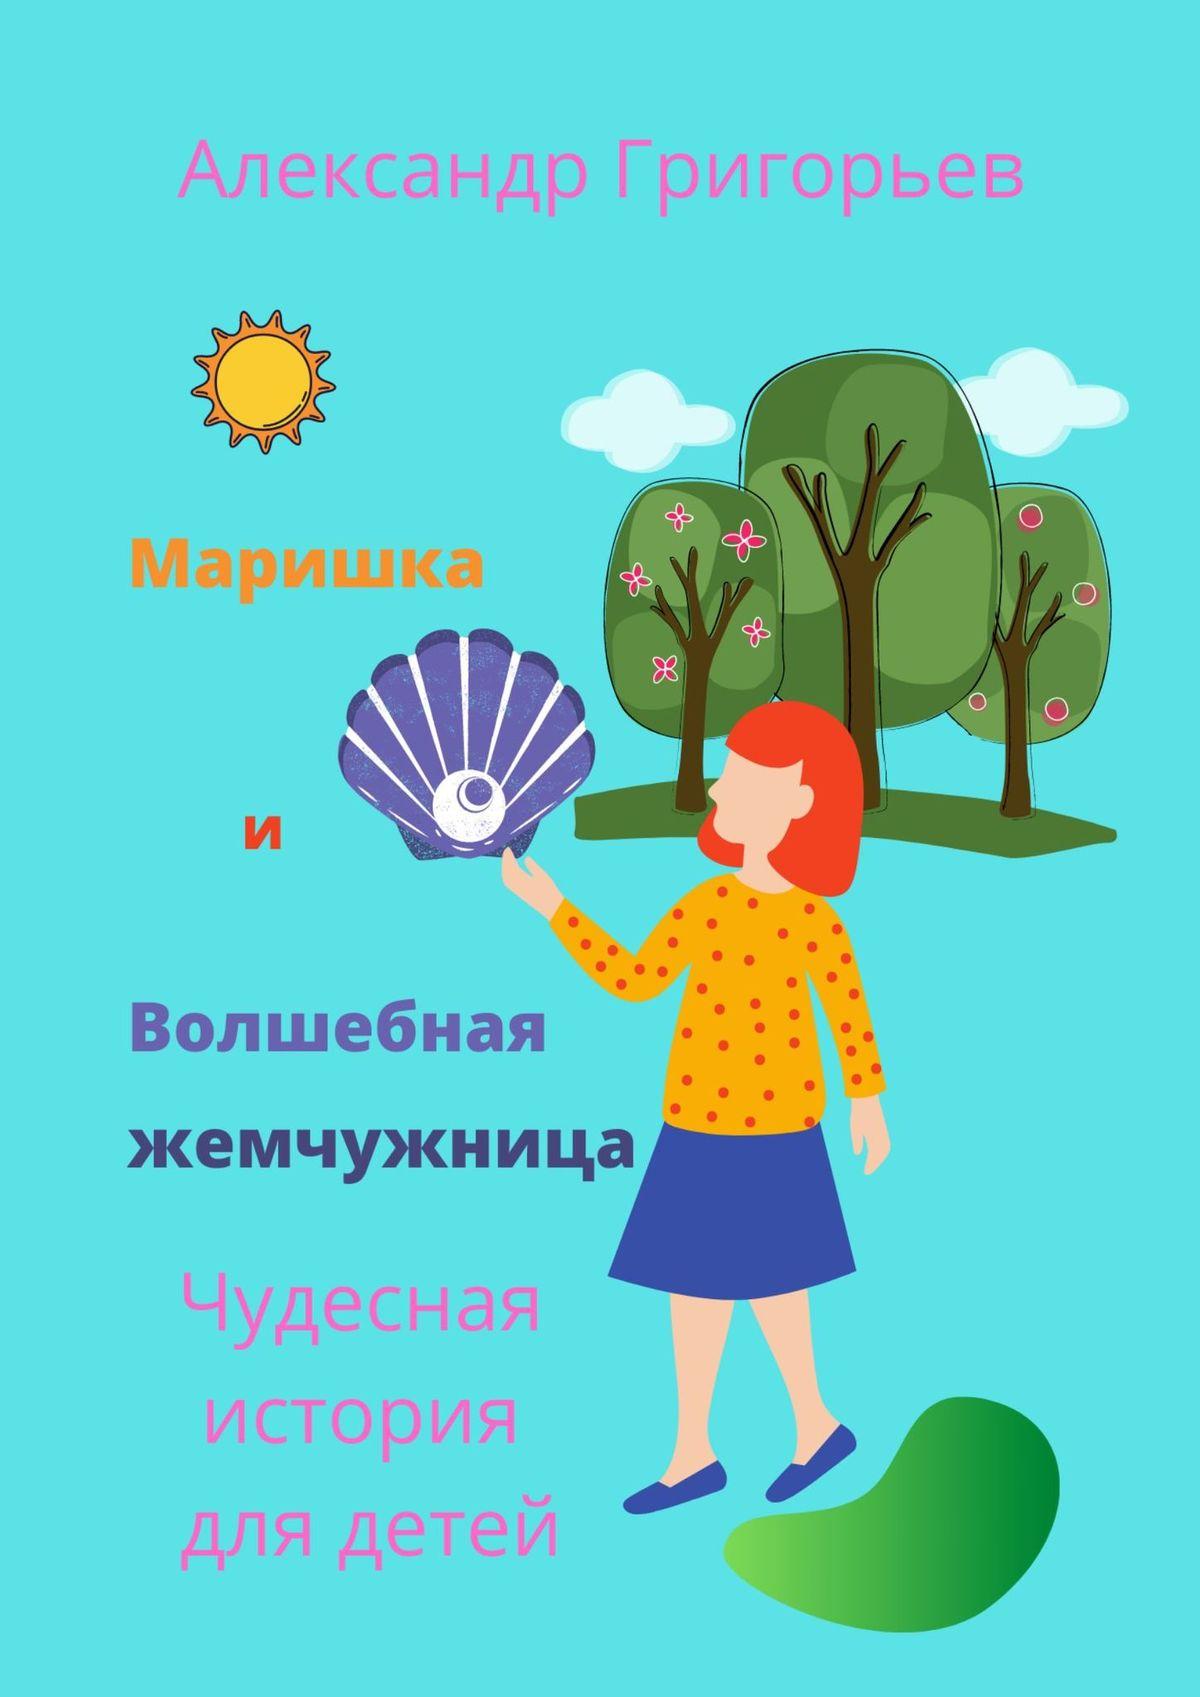 Александр Григорьев Маришка иВолшебная жемчужница александр григорьев создатель будущего